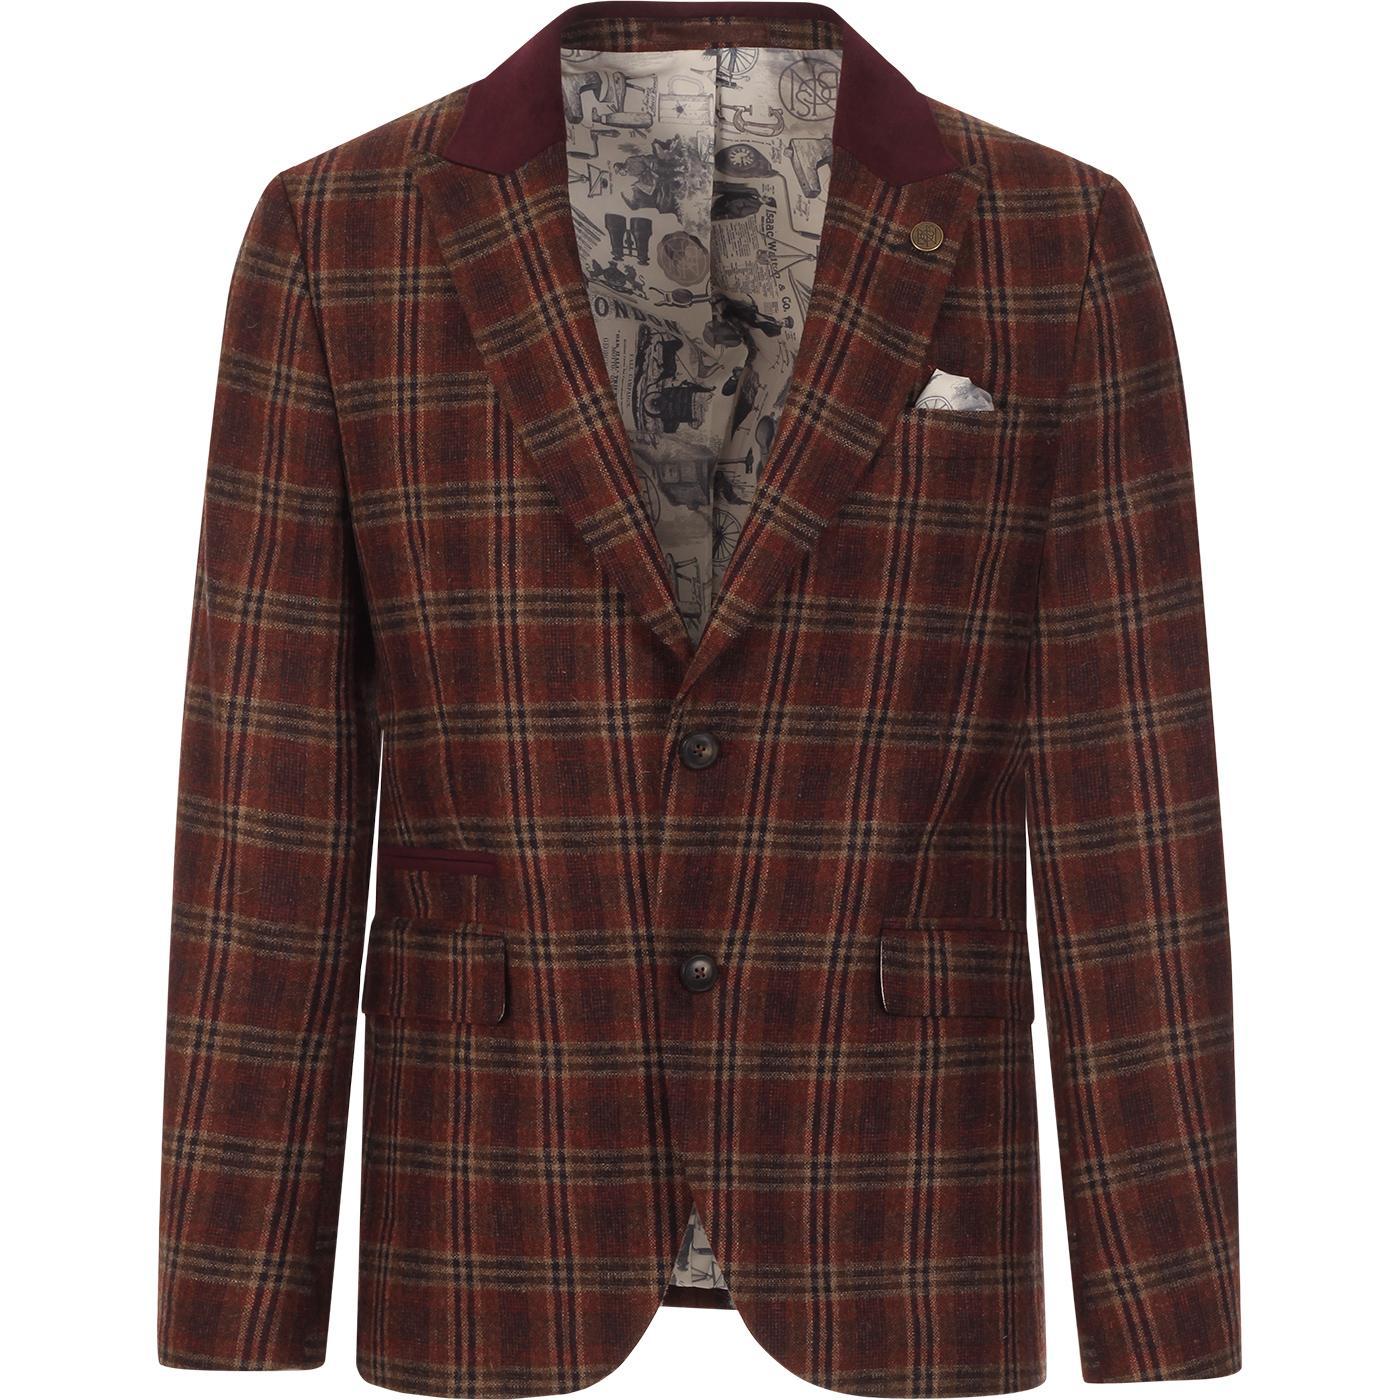 GIBSON LONDON Orange Check Teddy Boy Blazer Jacket